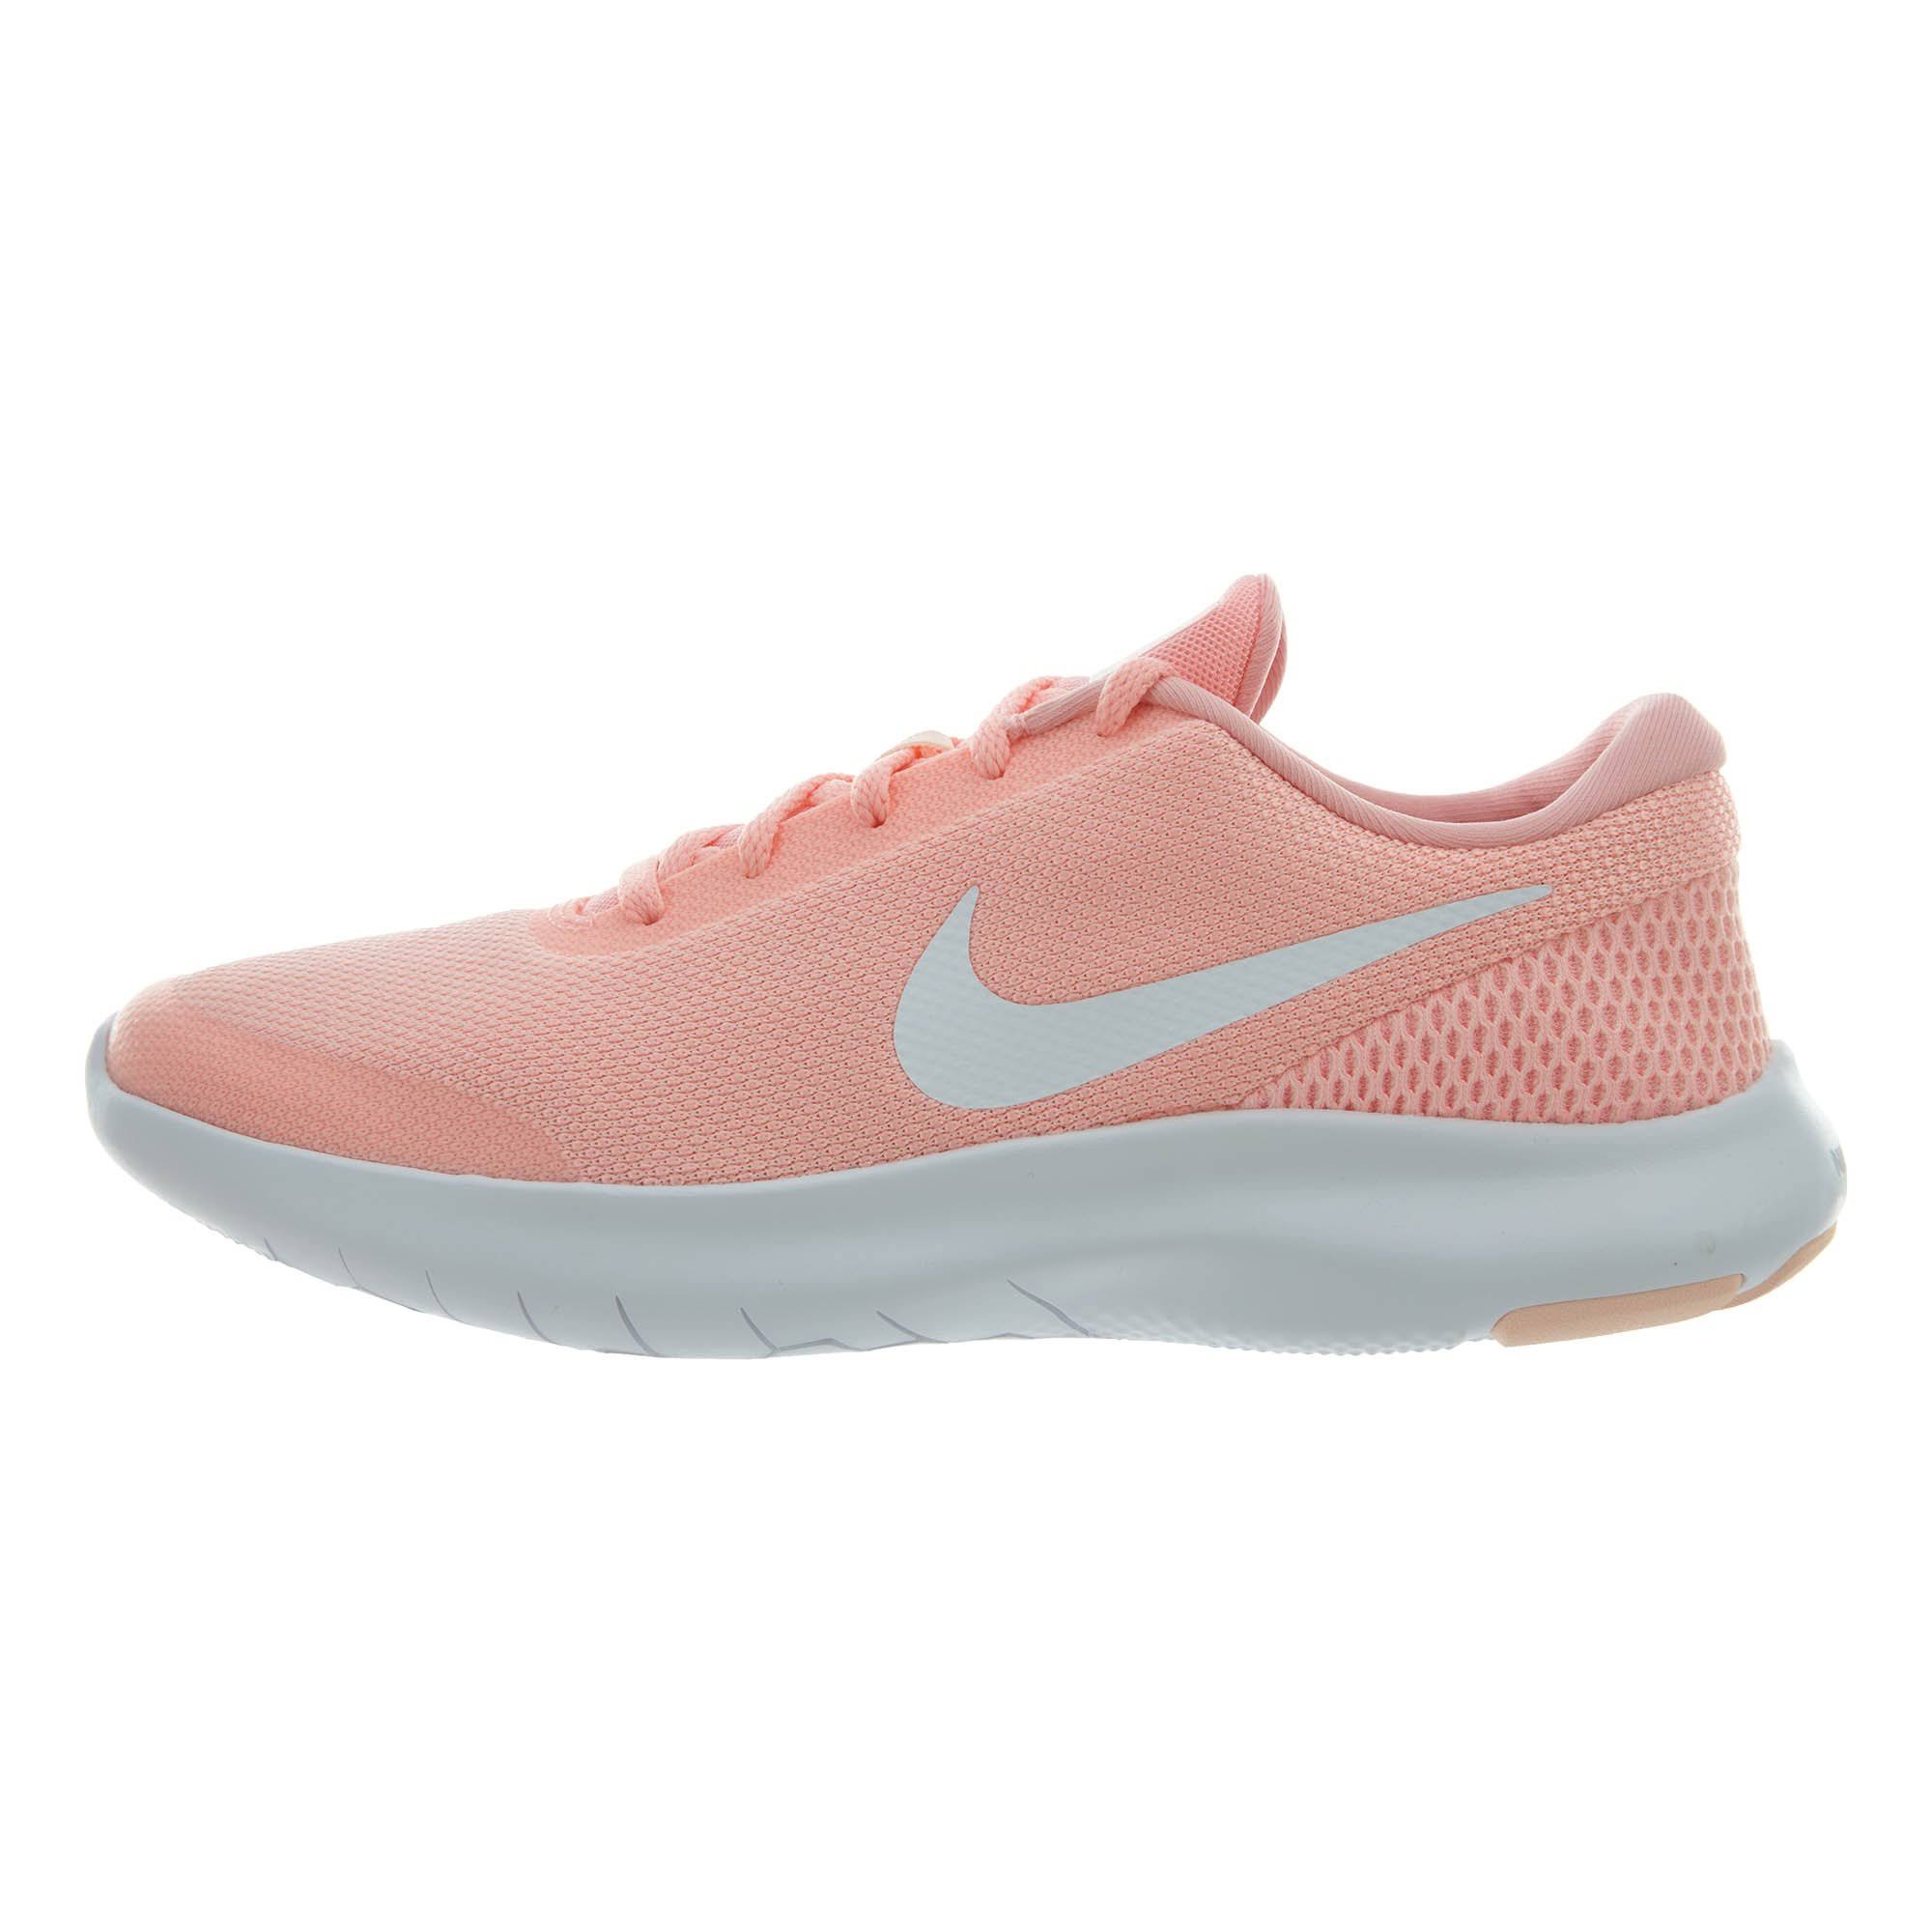 Donna Da Crim6 Flex 7Rosa Running Experience Medium Nike Rn Scarpe Bianca Tinta PXTkZOui